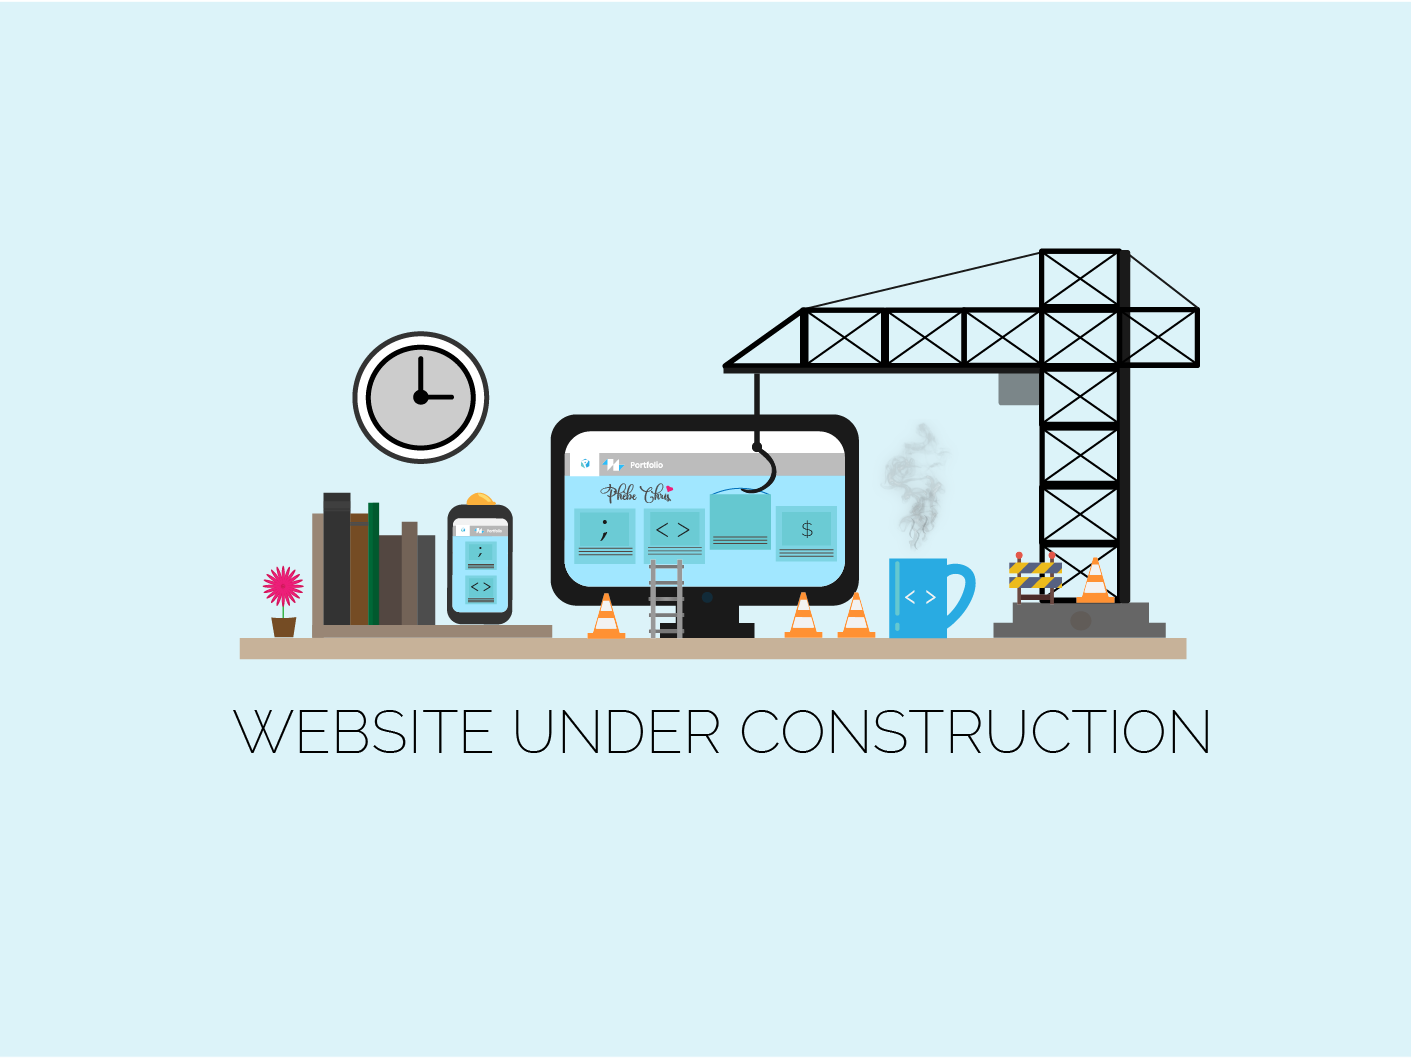 webconstruction